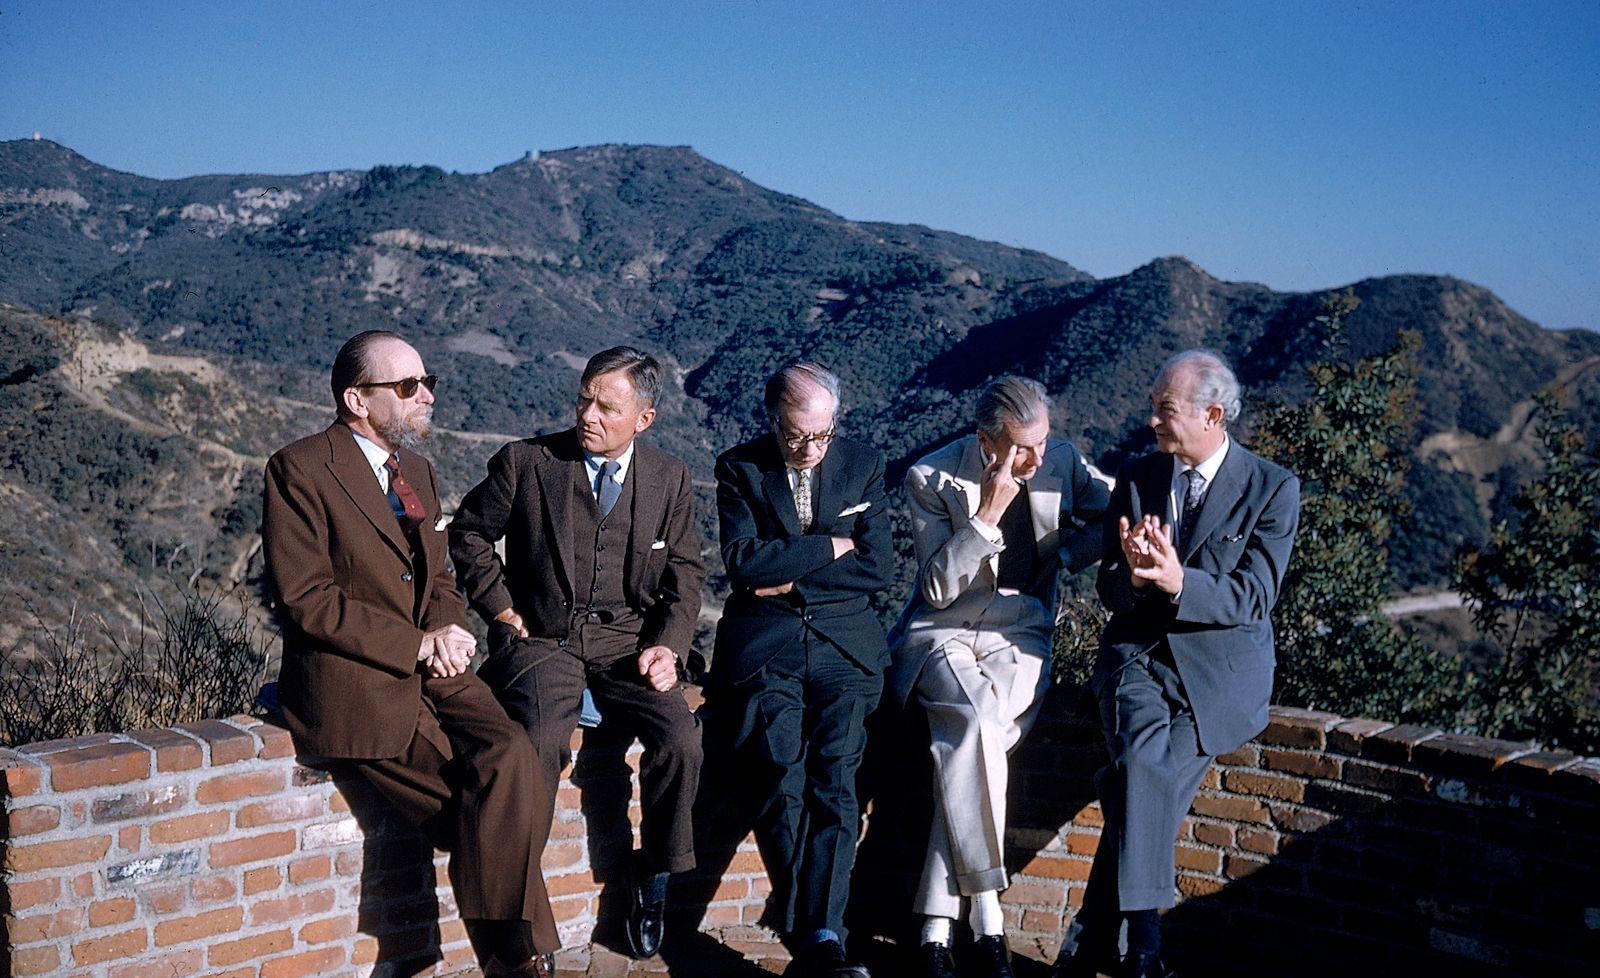 Pauling, Heard, Isherwood, & Two Huxleys